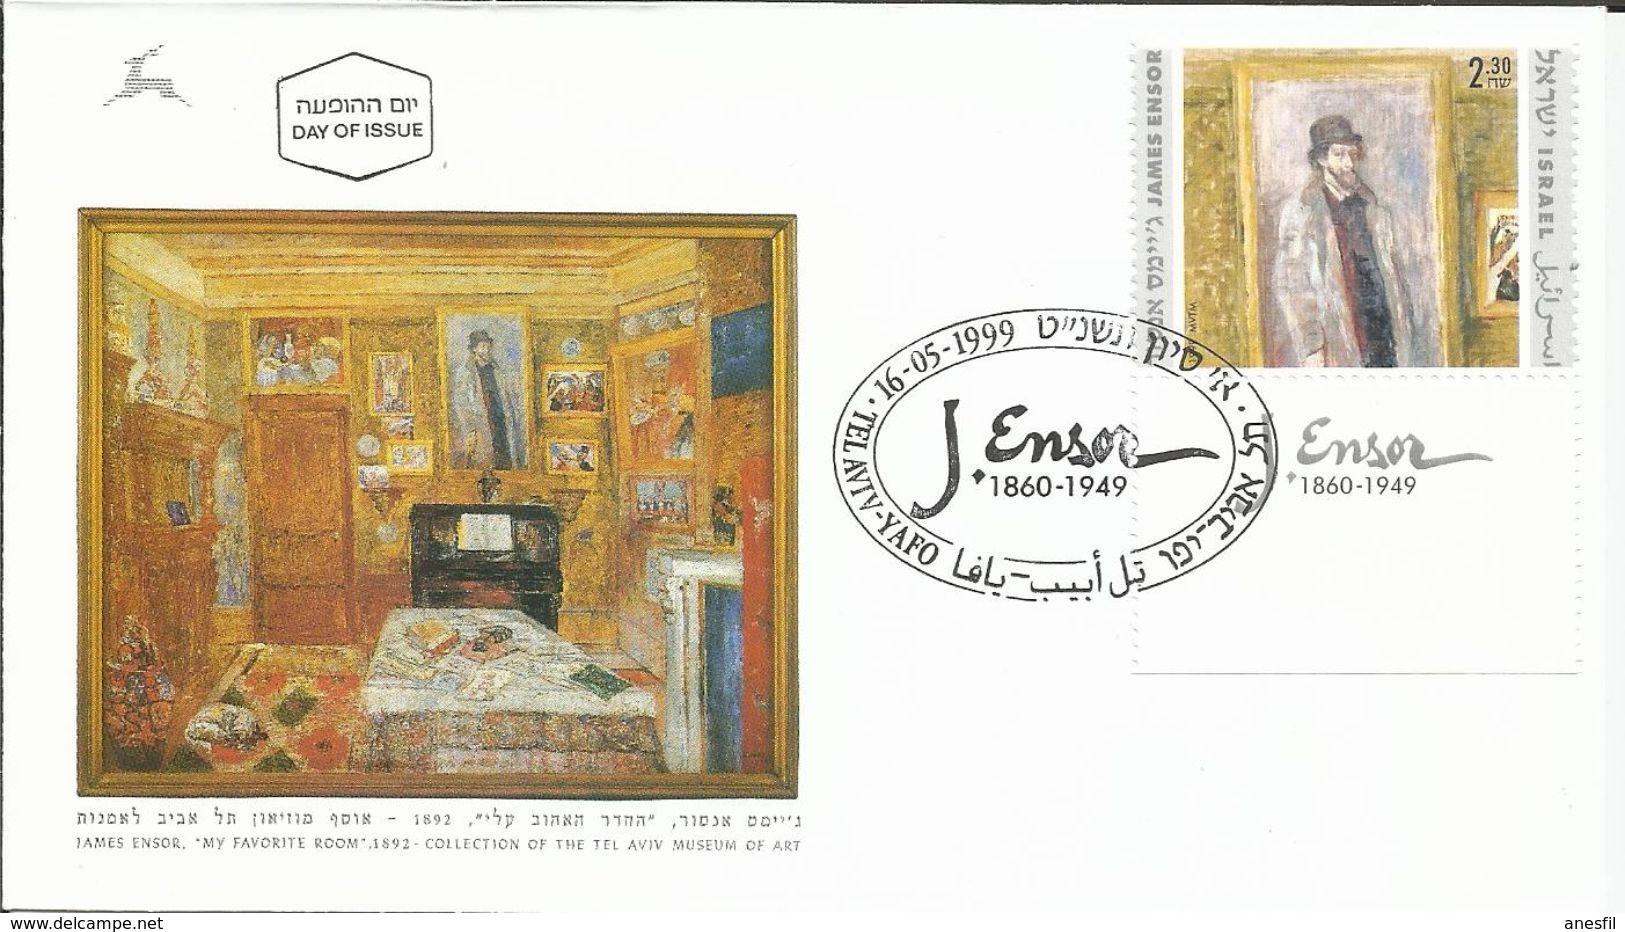 Pintor James Ensor.  (Pintura) - Profesiones